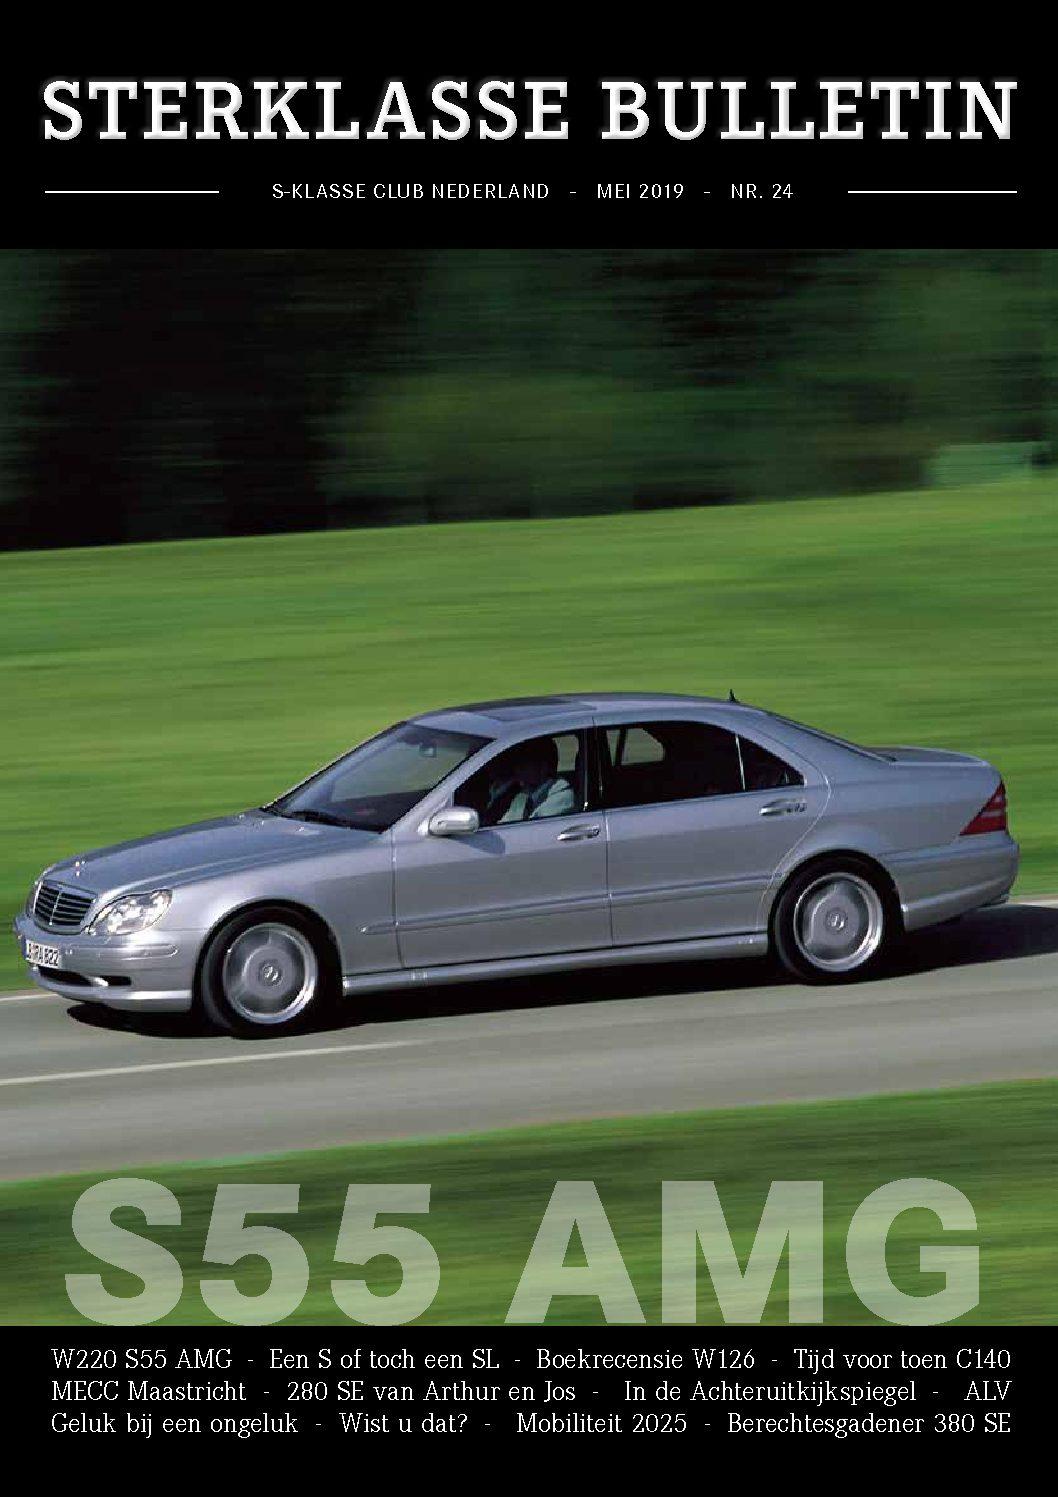 Sterklasse-Bulletin 17 - SKCN Mercedes-Benz S-Klasse Club Nederland